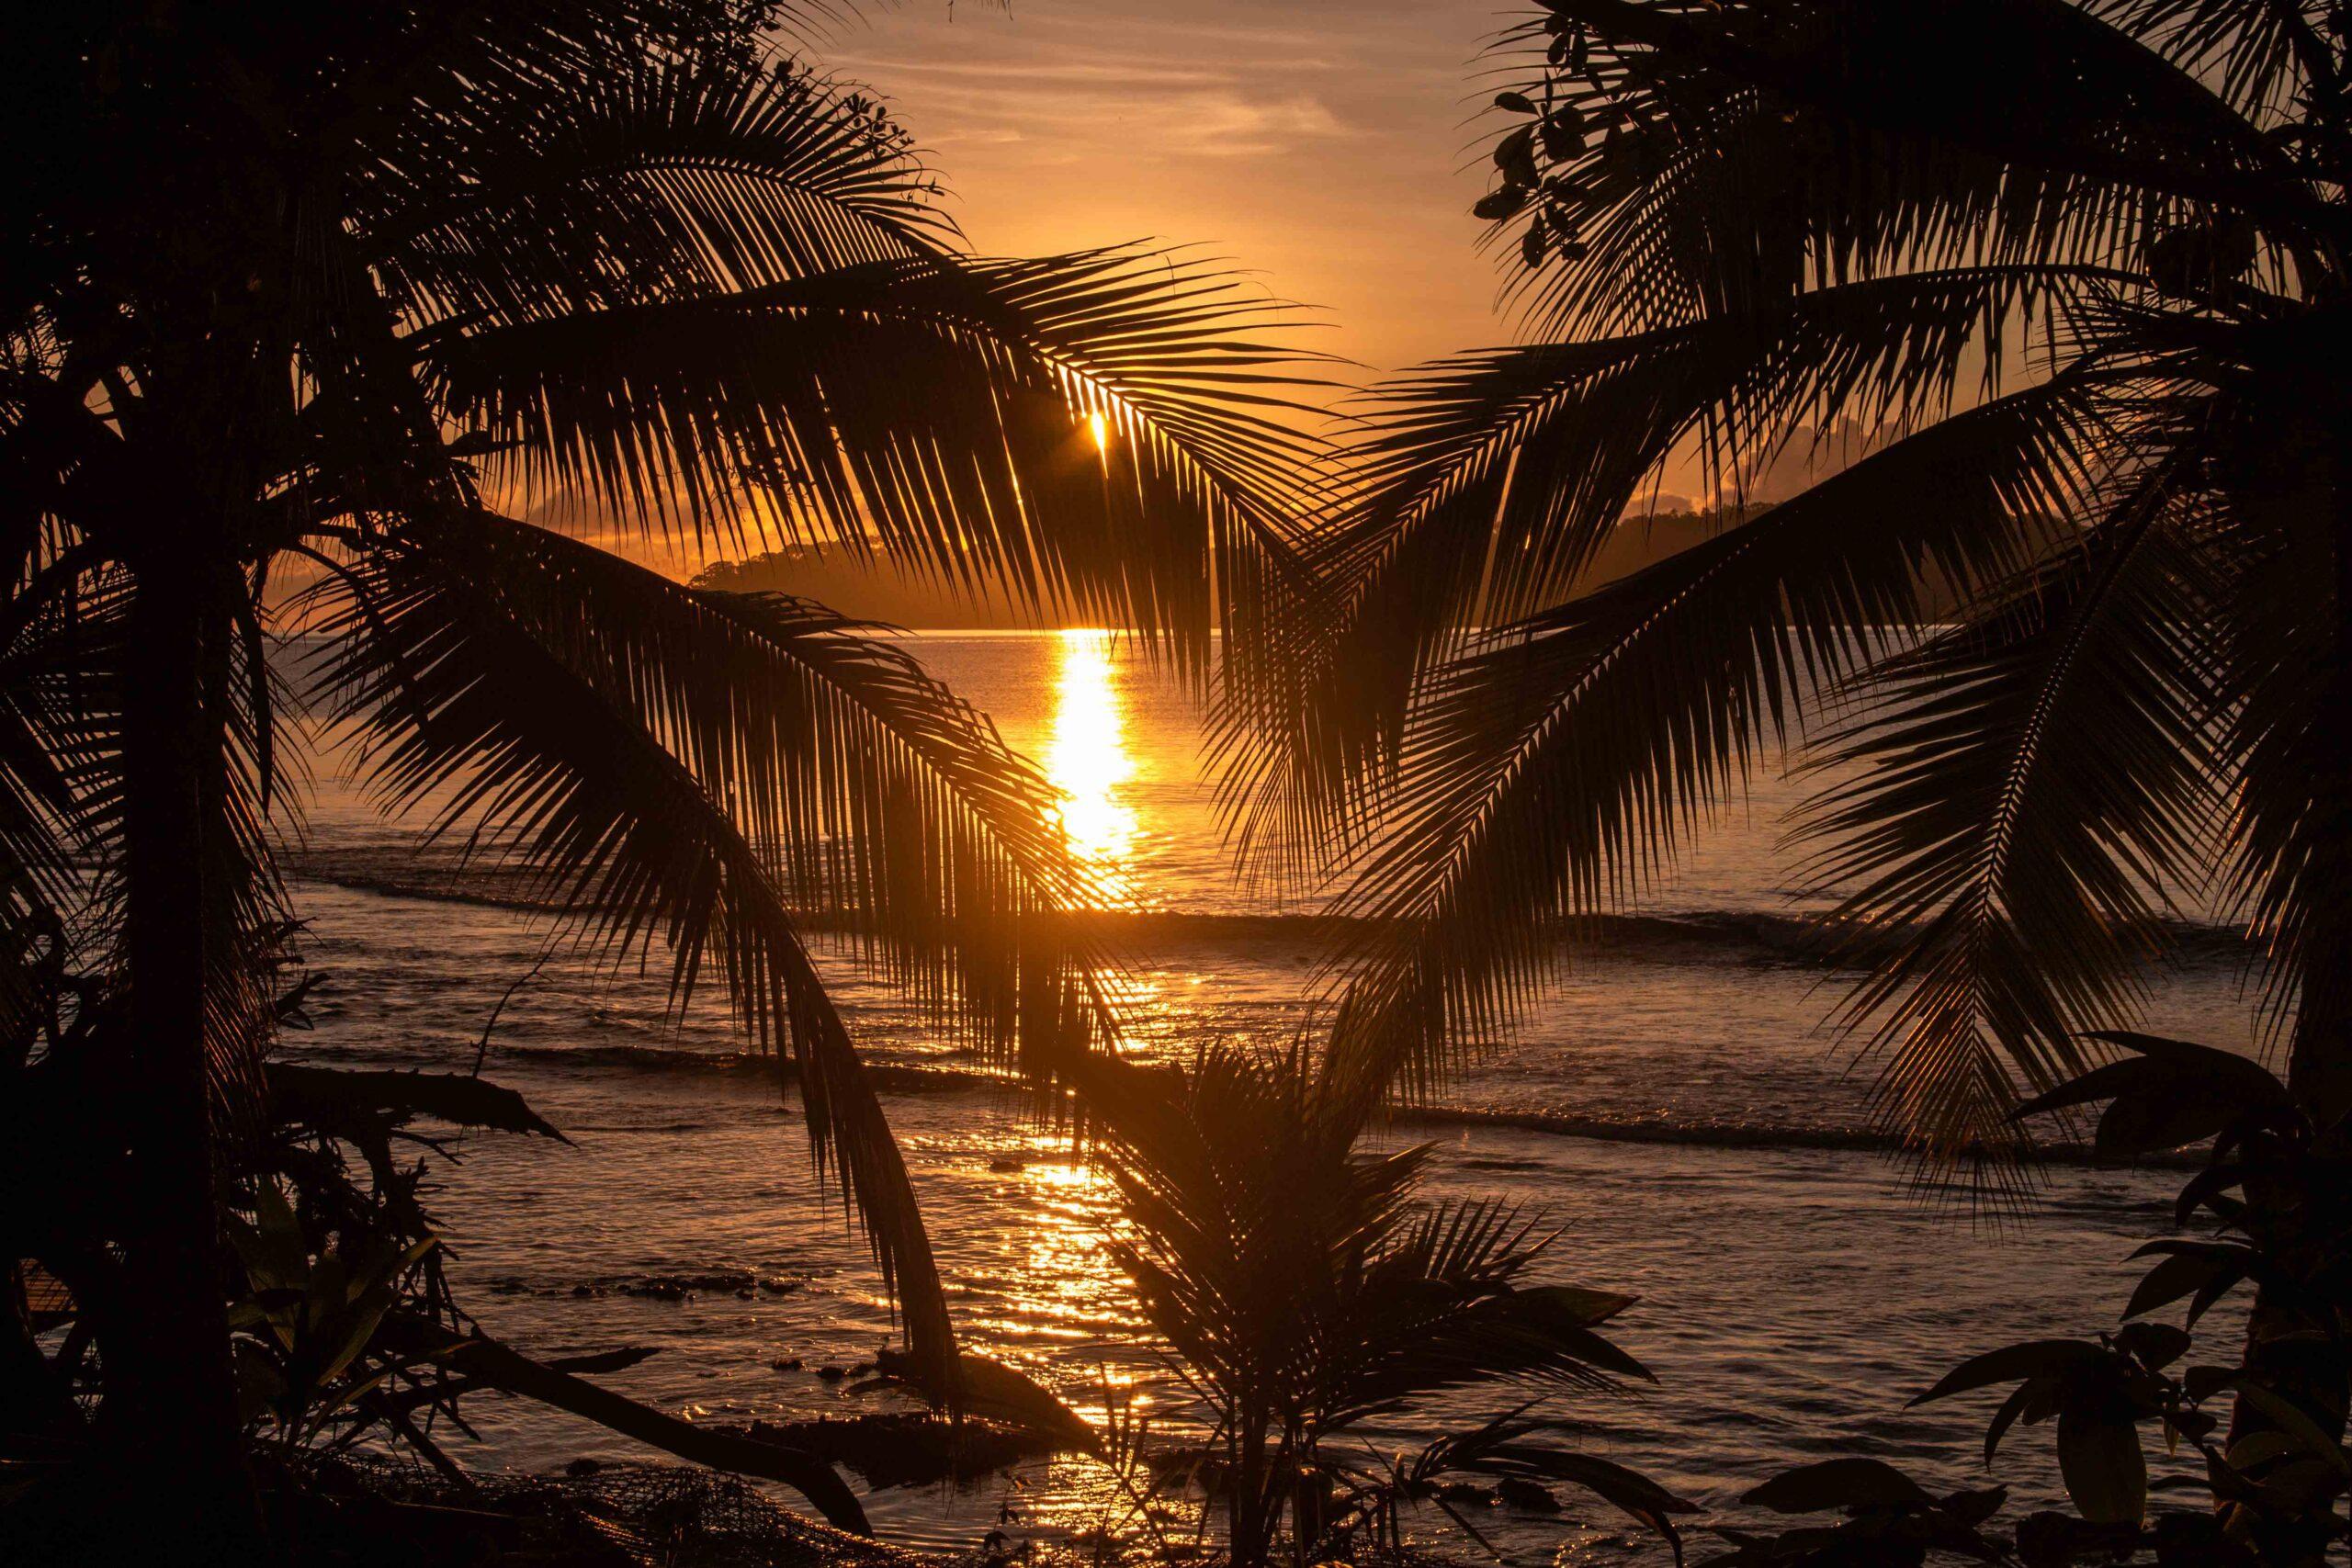 Sunset at Bocas del Drago Panama